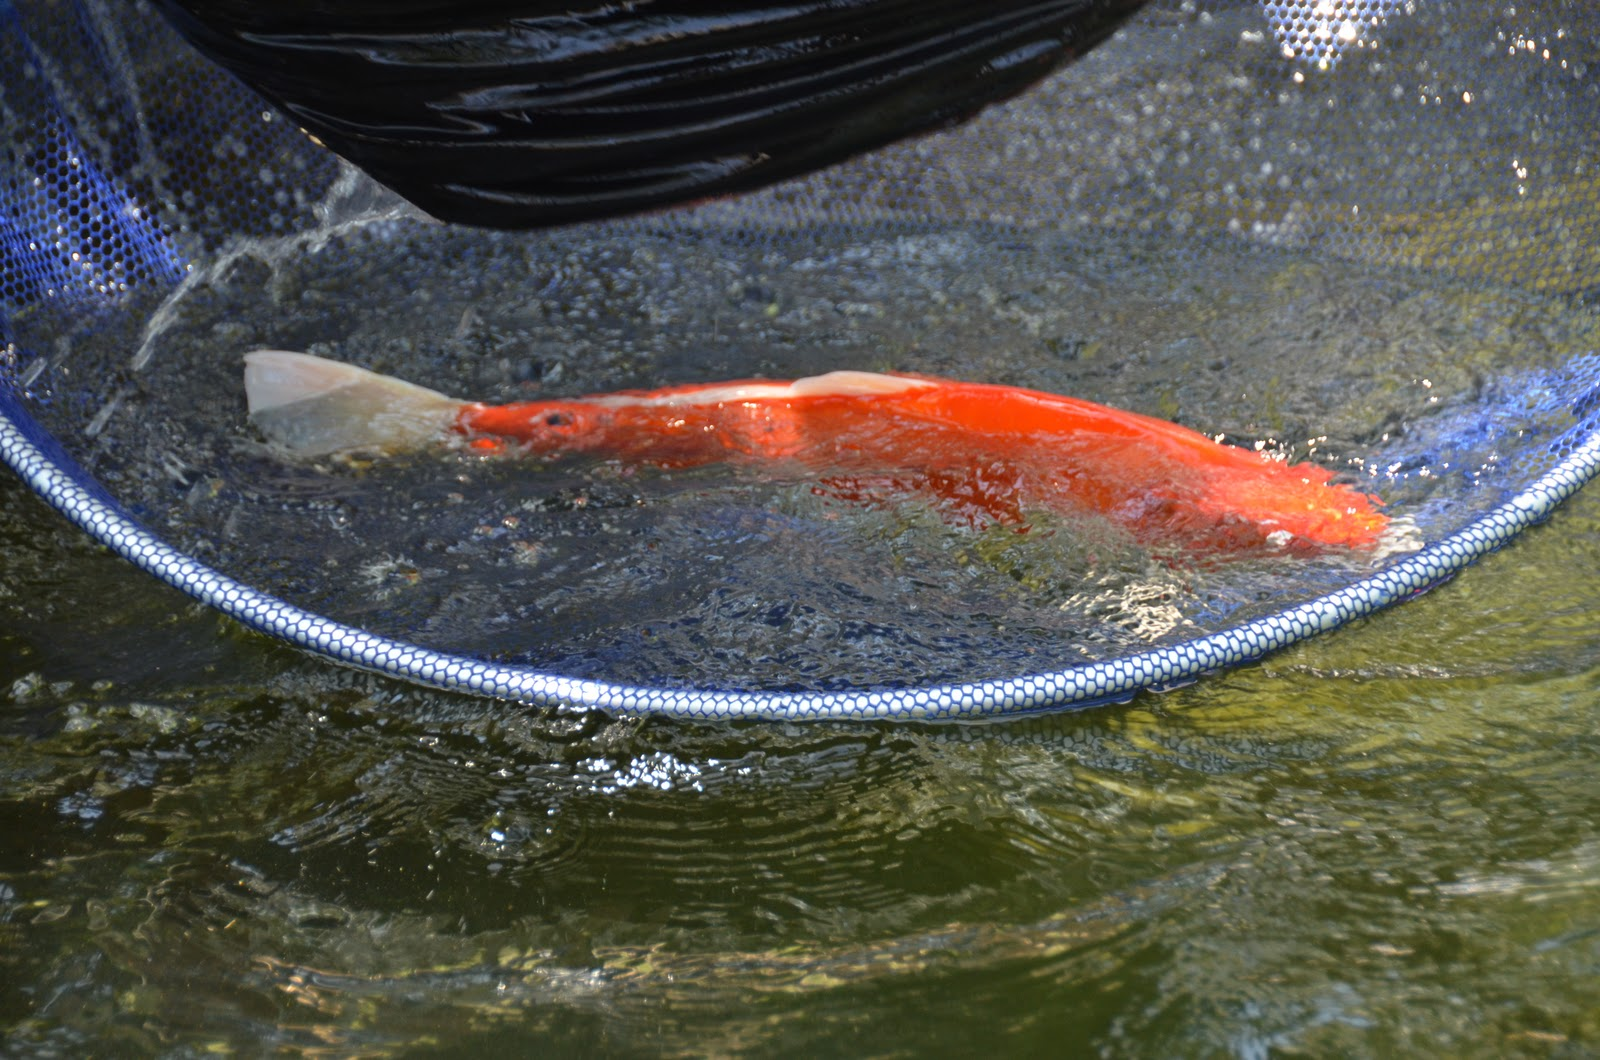 Koi Fish For The Koi Pond A Grateful Life